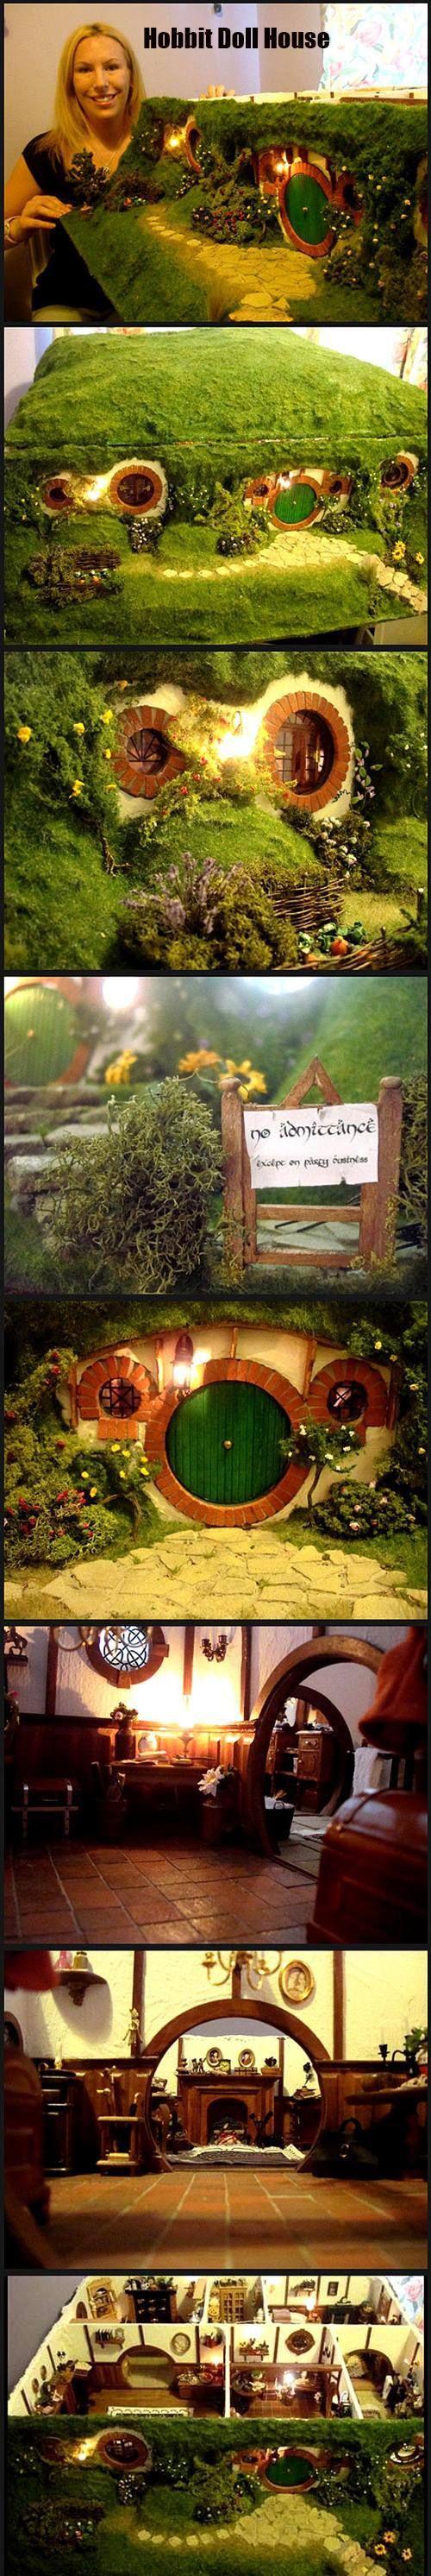 Hobbit! Fantastic~ #awesome #houses #hobbit